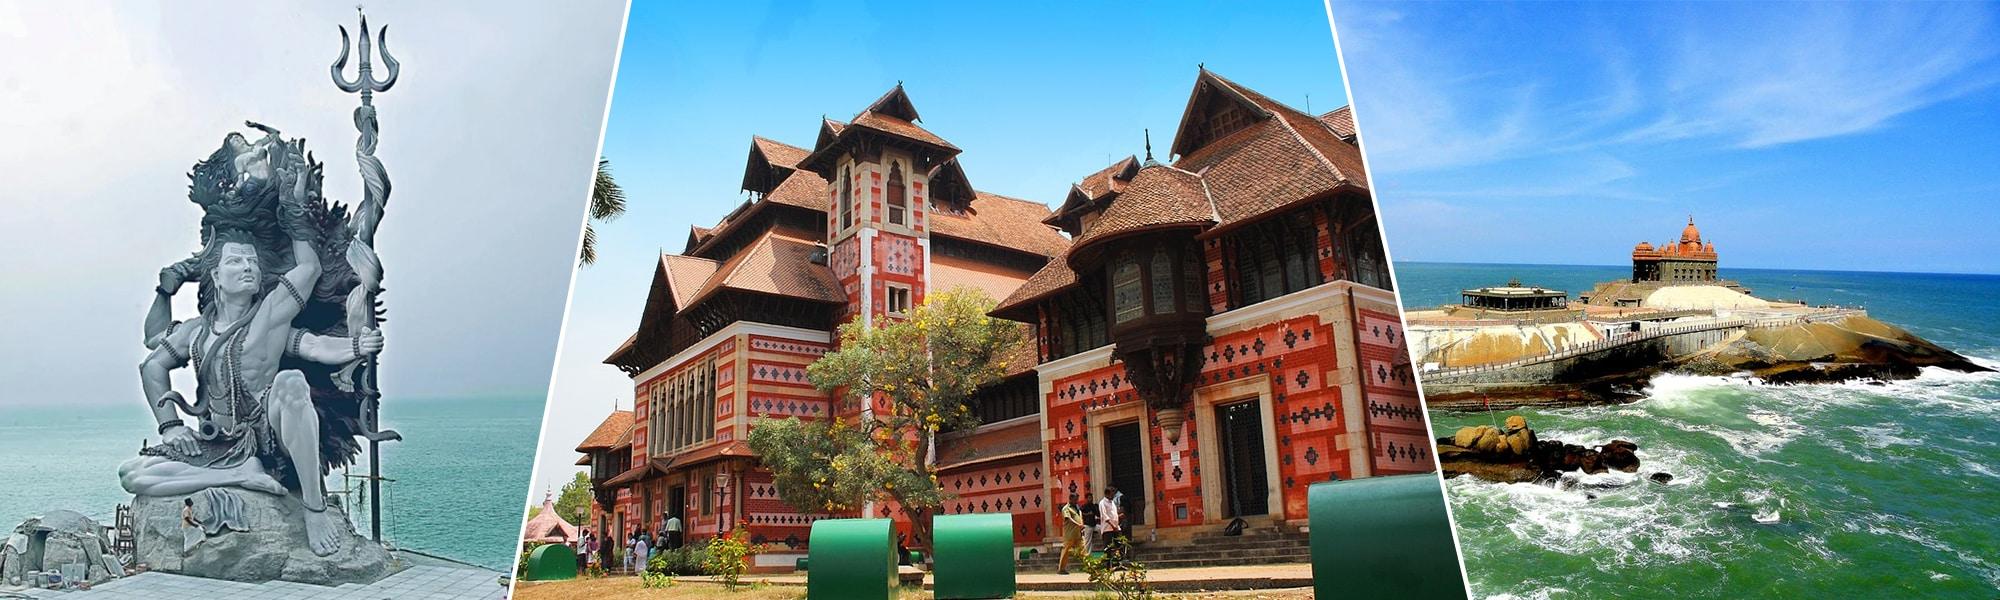 Kanyakumari Azhimala Trivandrum Tour